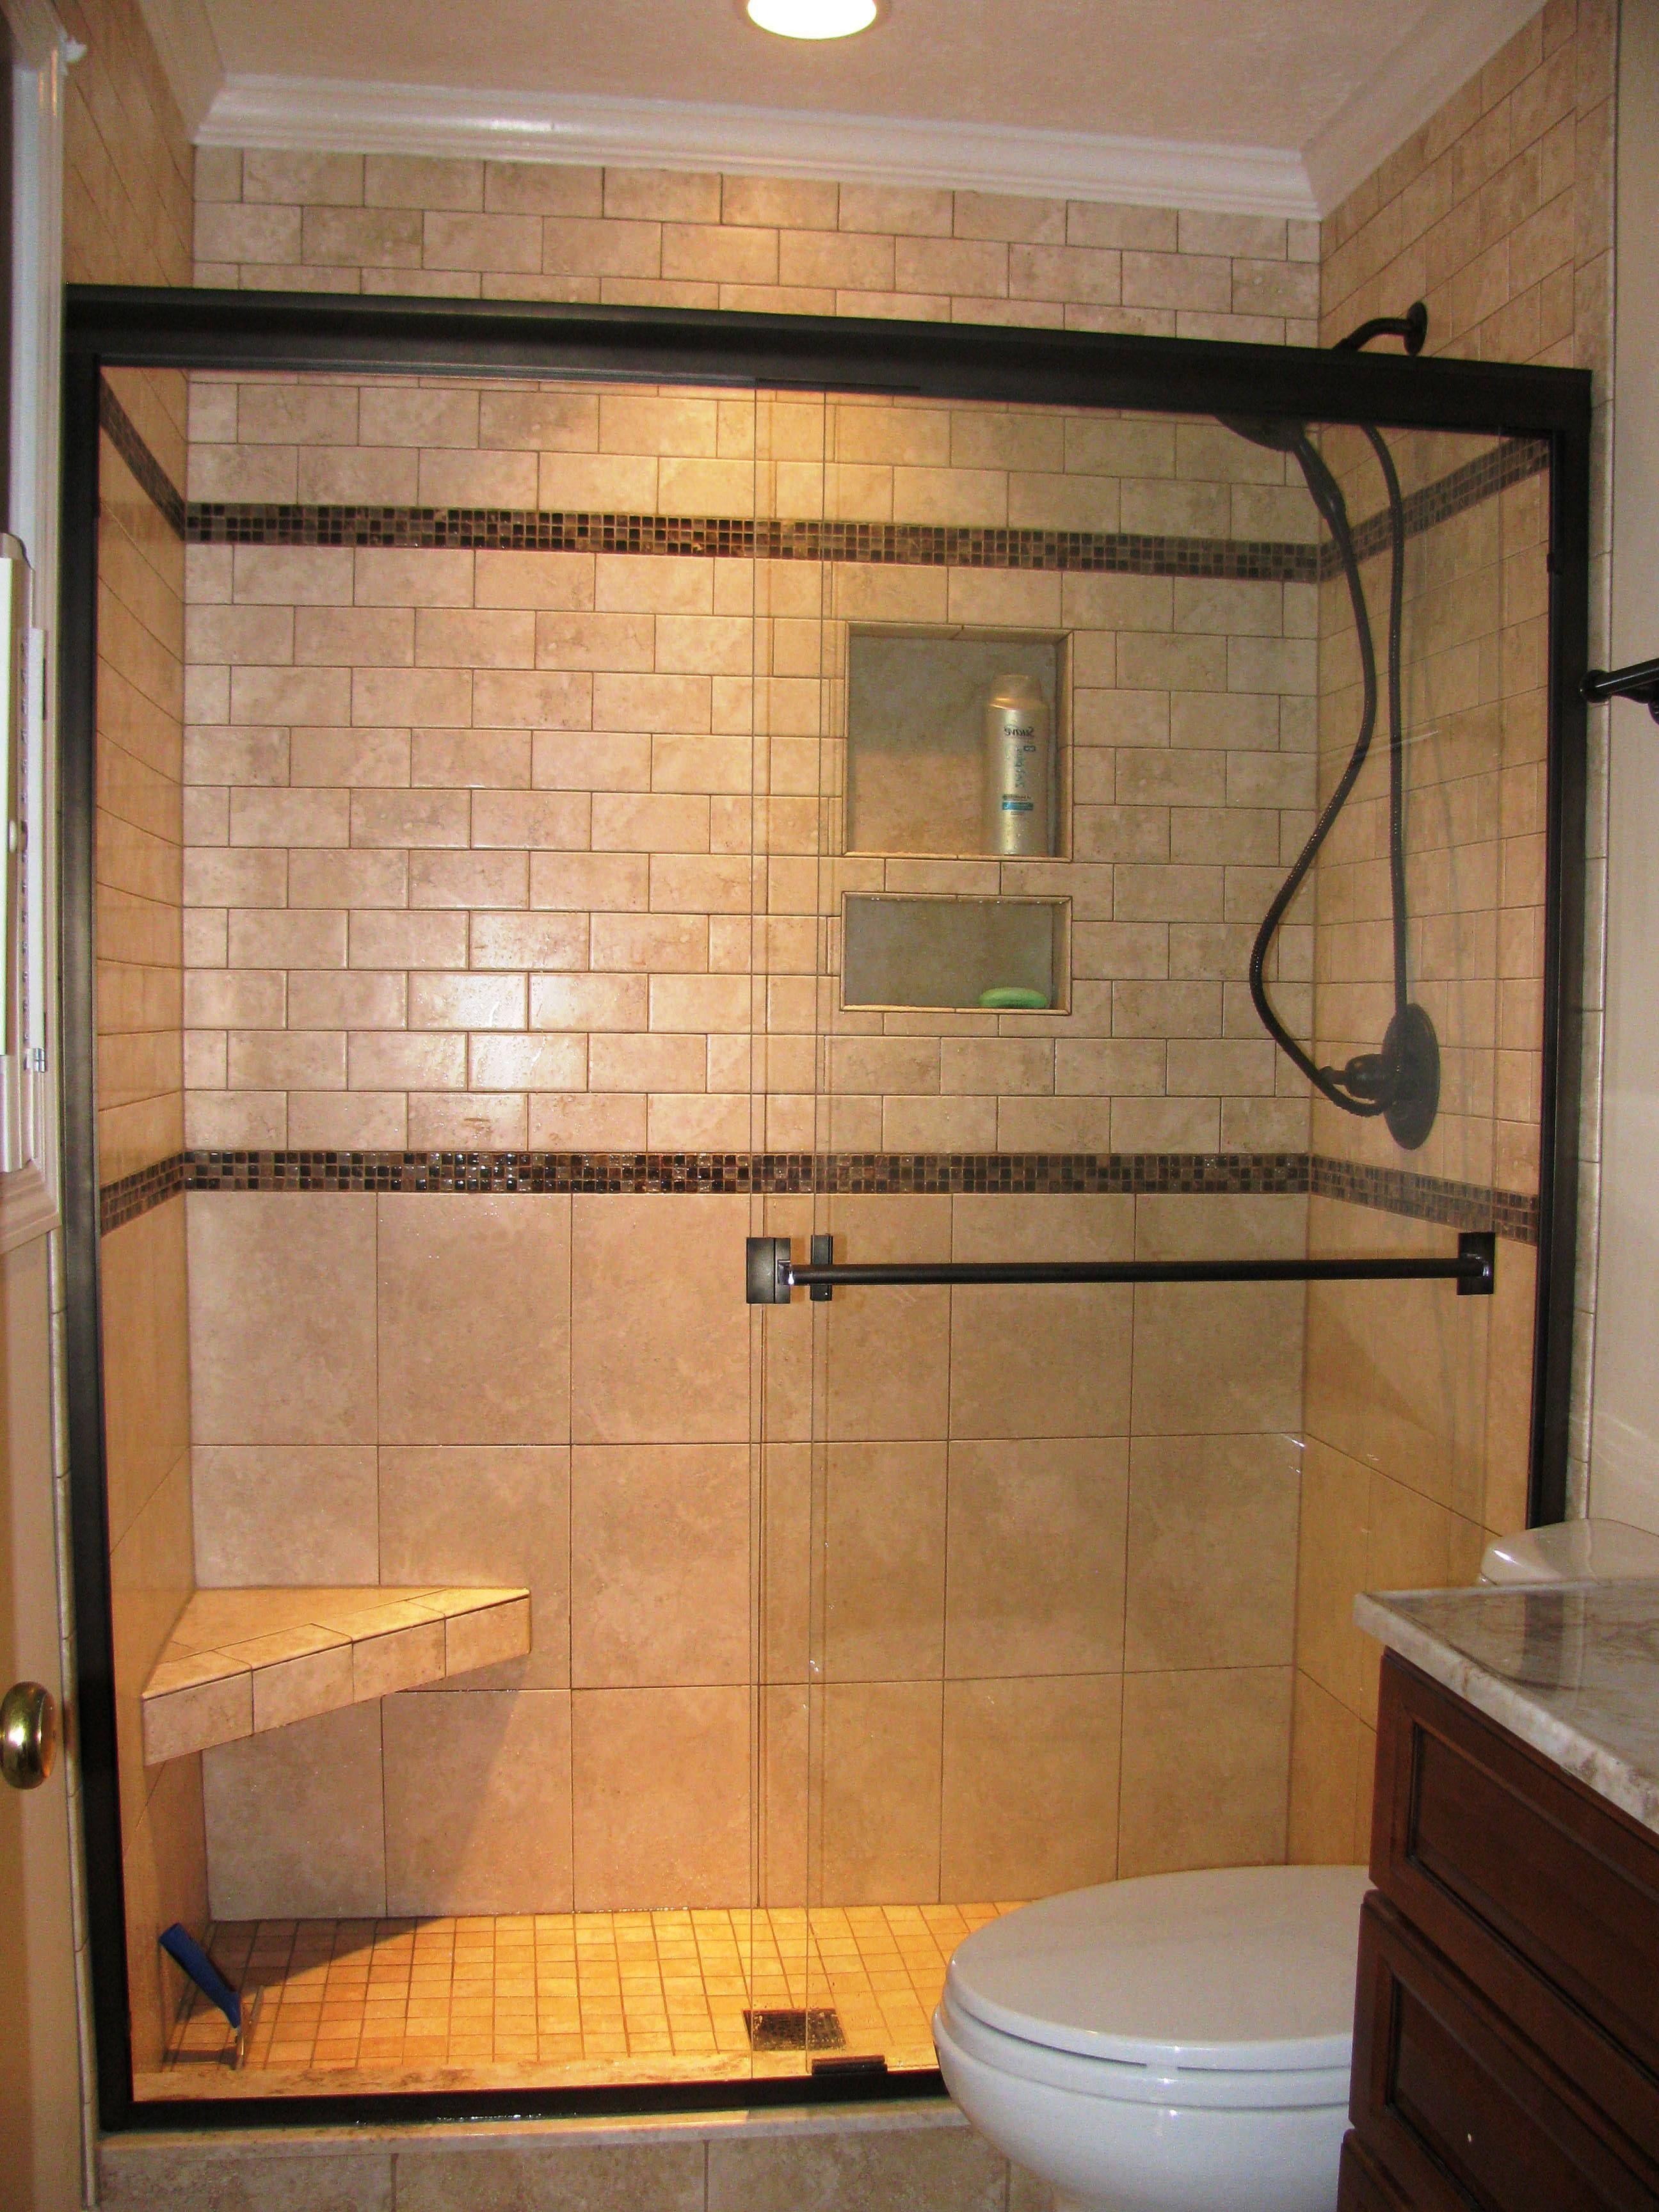 Small Bathroom Design Ideas On a Budget | Bathroom : Small Bathroom ...